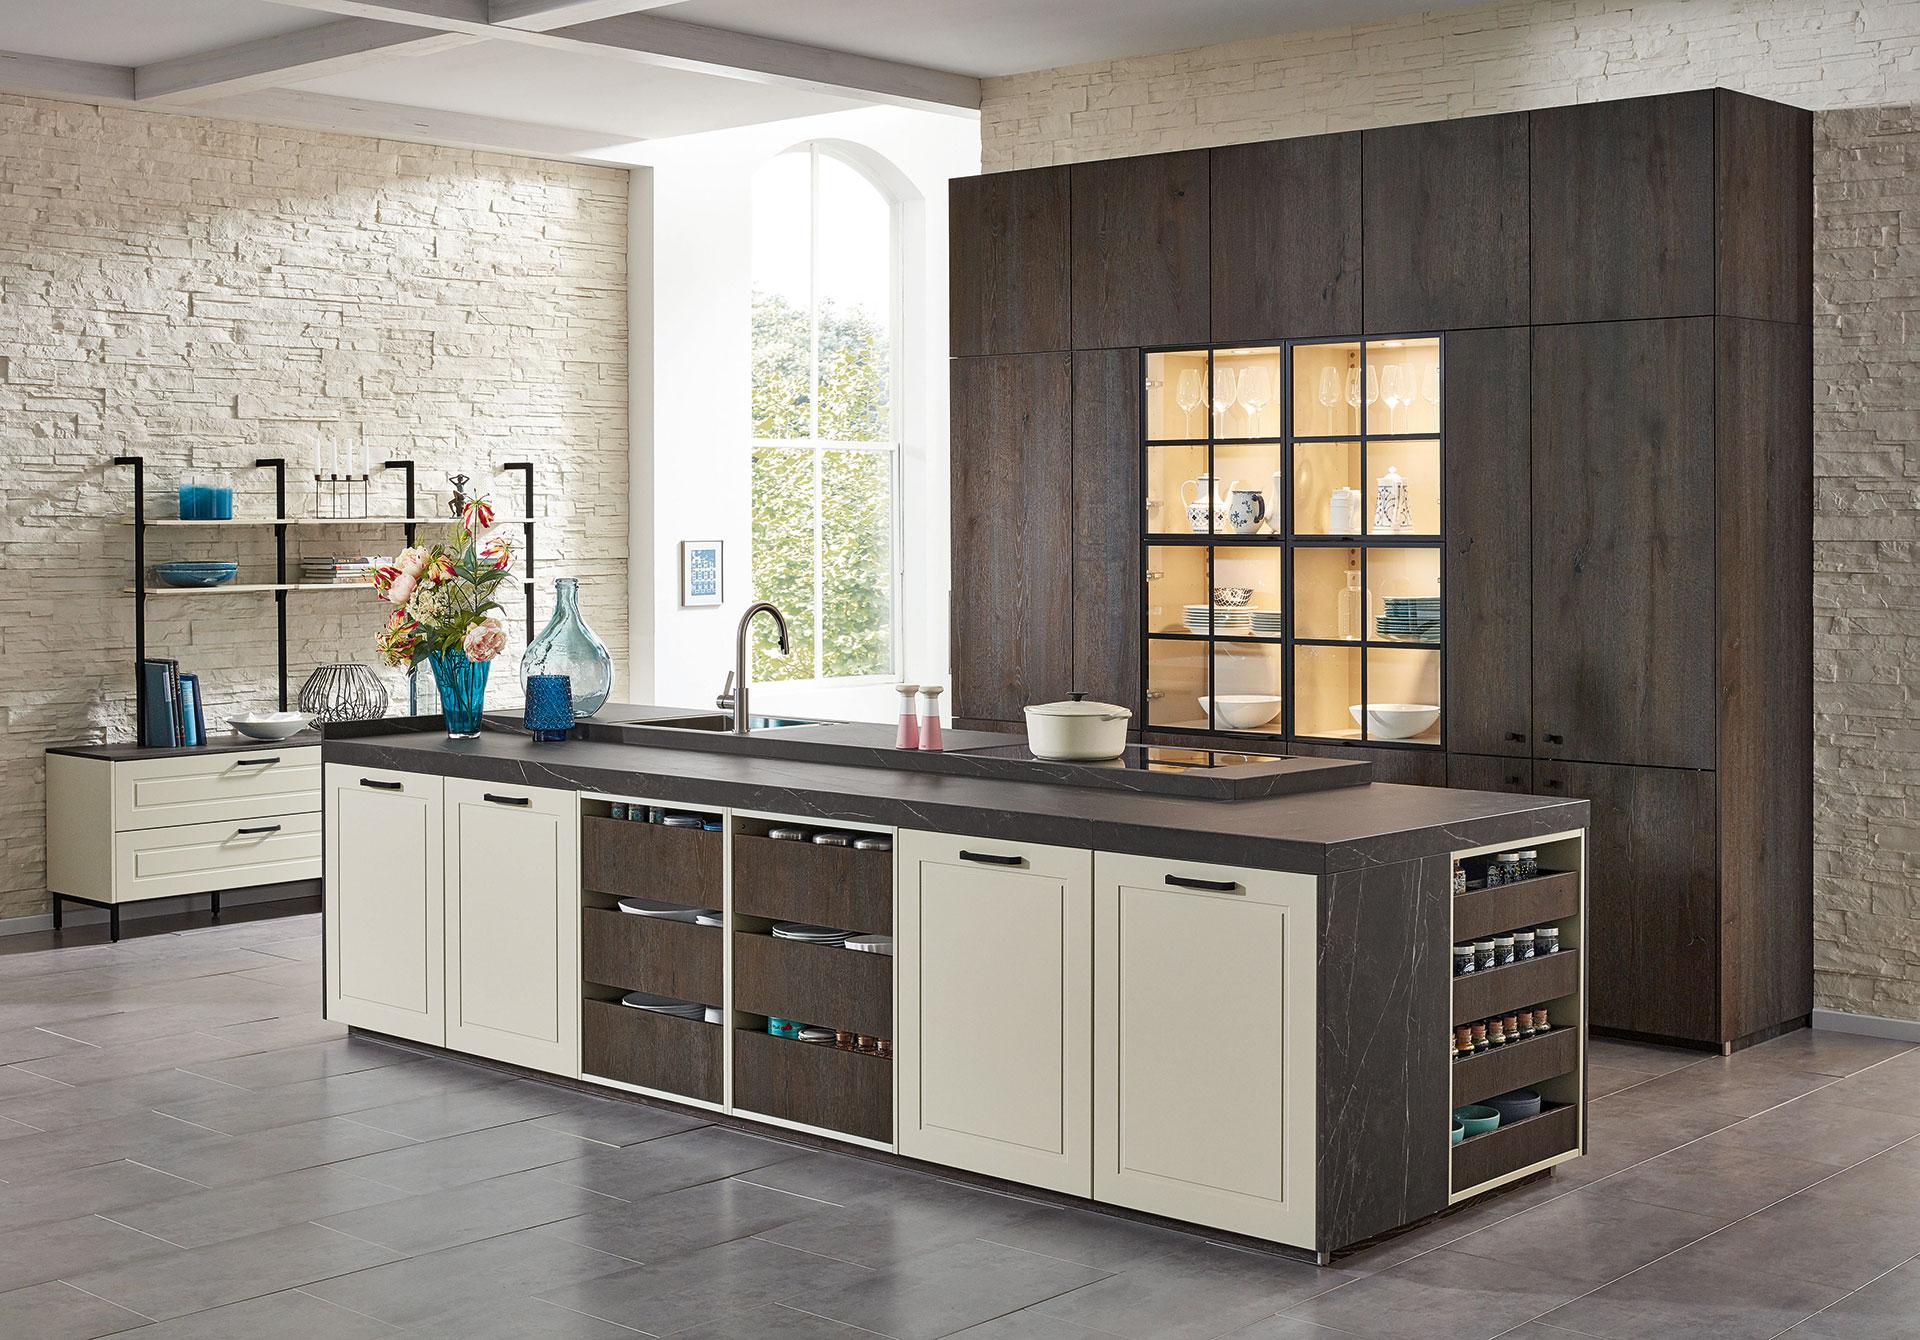 Sapienstone Colori Scuri E Neutri Per I Top Cucina 2020 Floornature